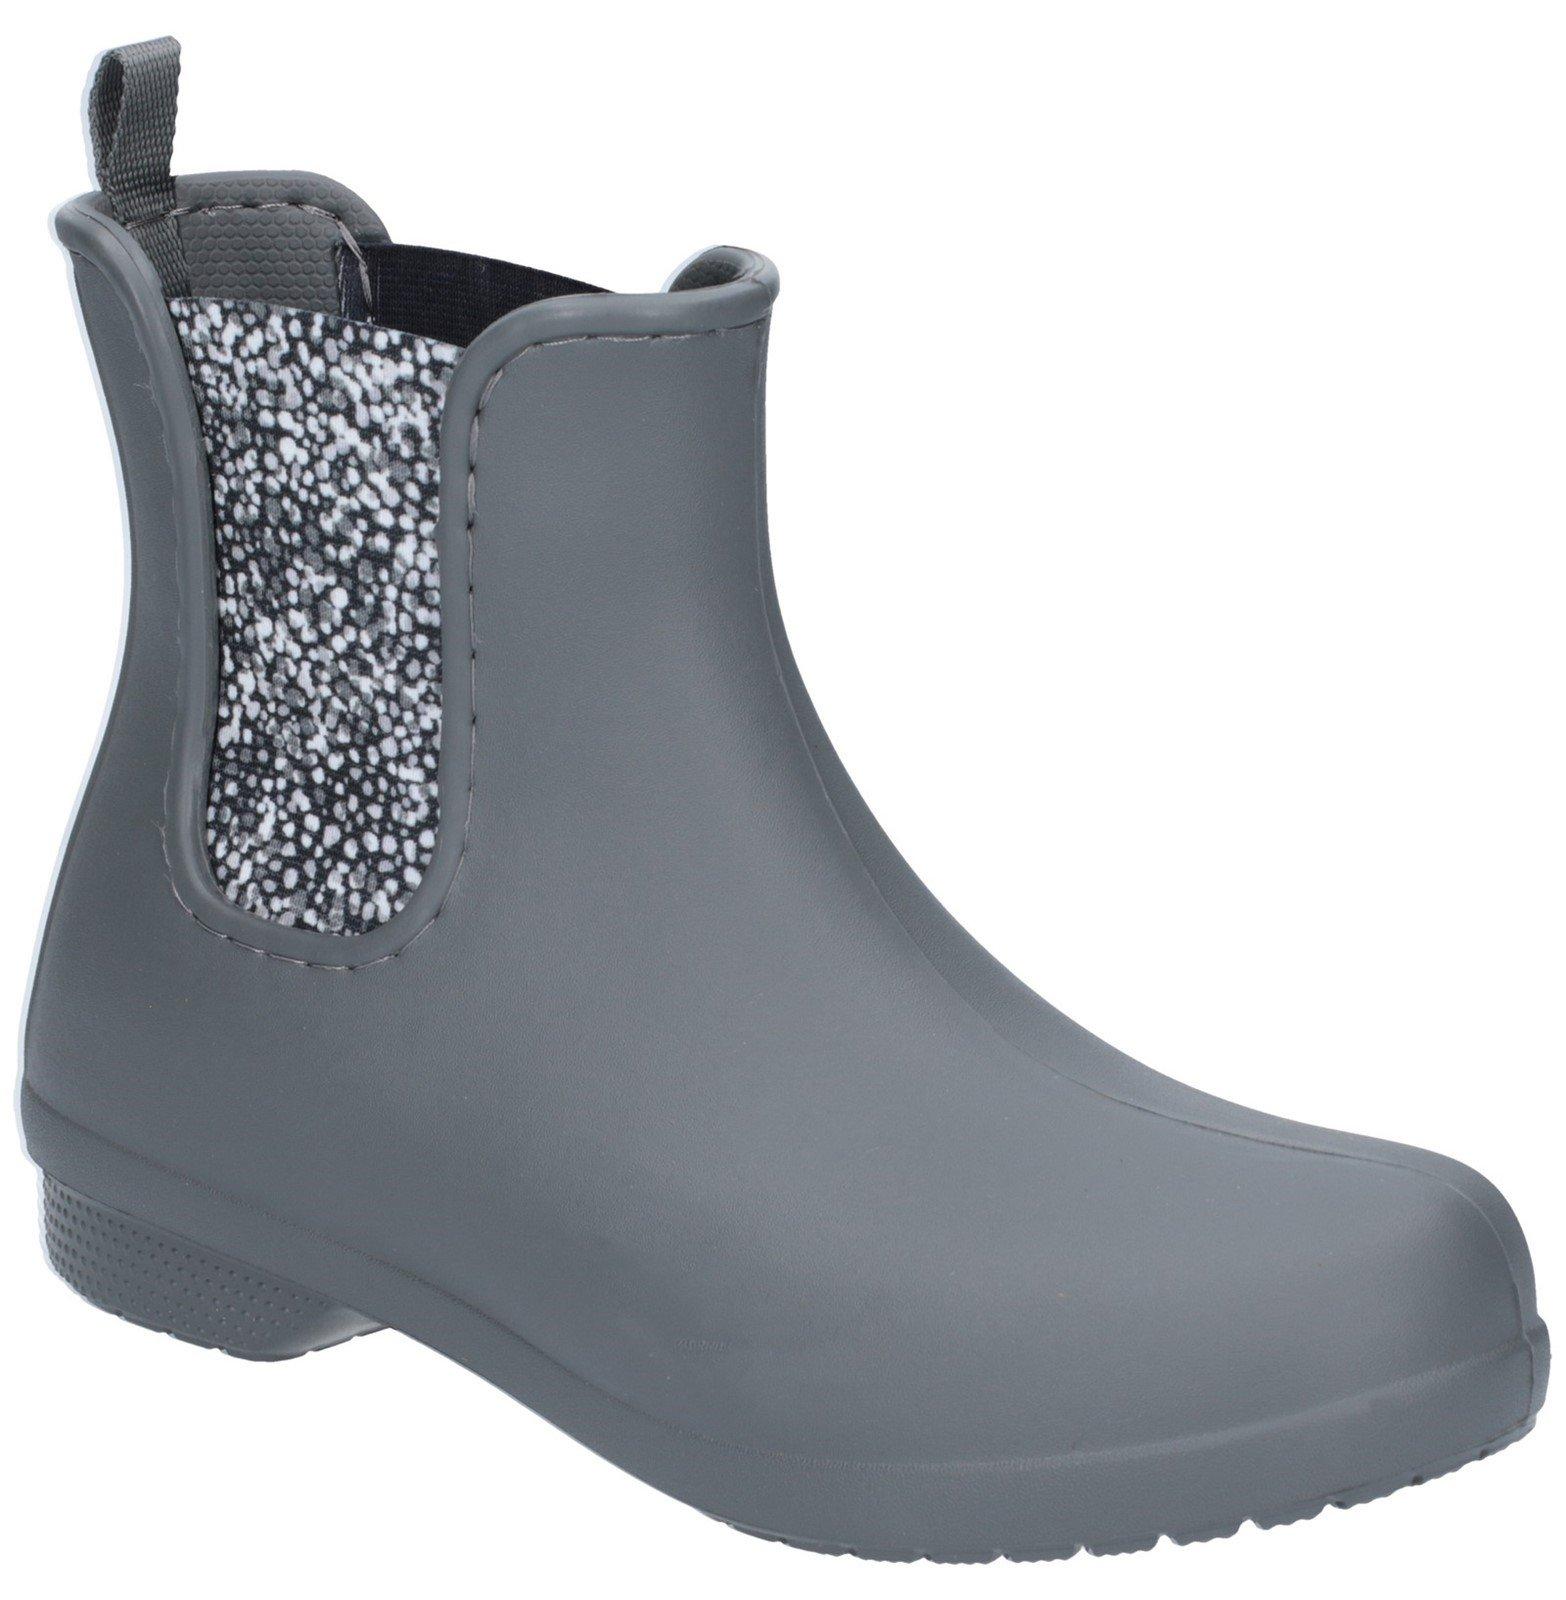 Crocs Women's Freesail Chelsea Boot Various Colours 27504 - Slate Grey/Dots 3